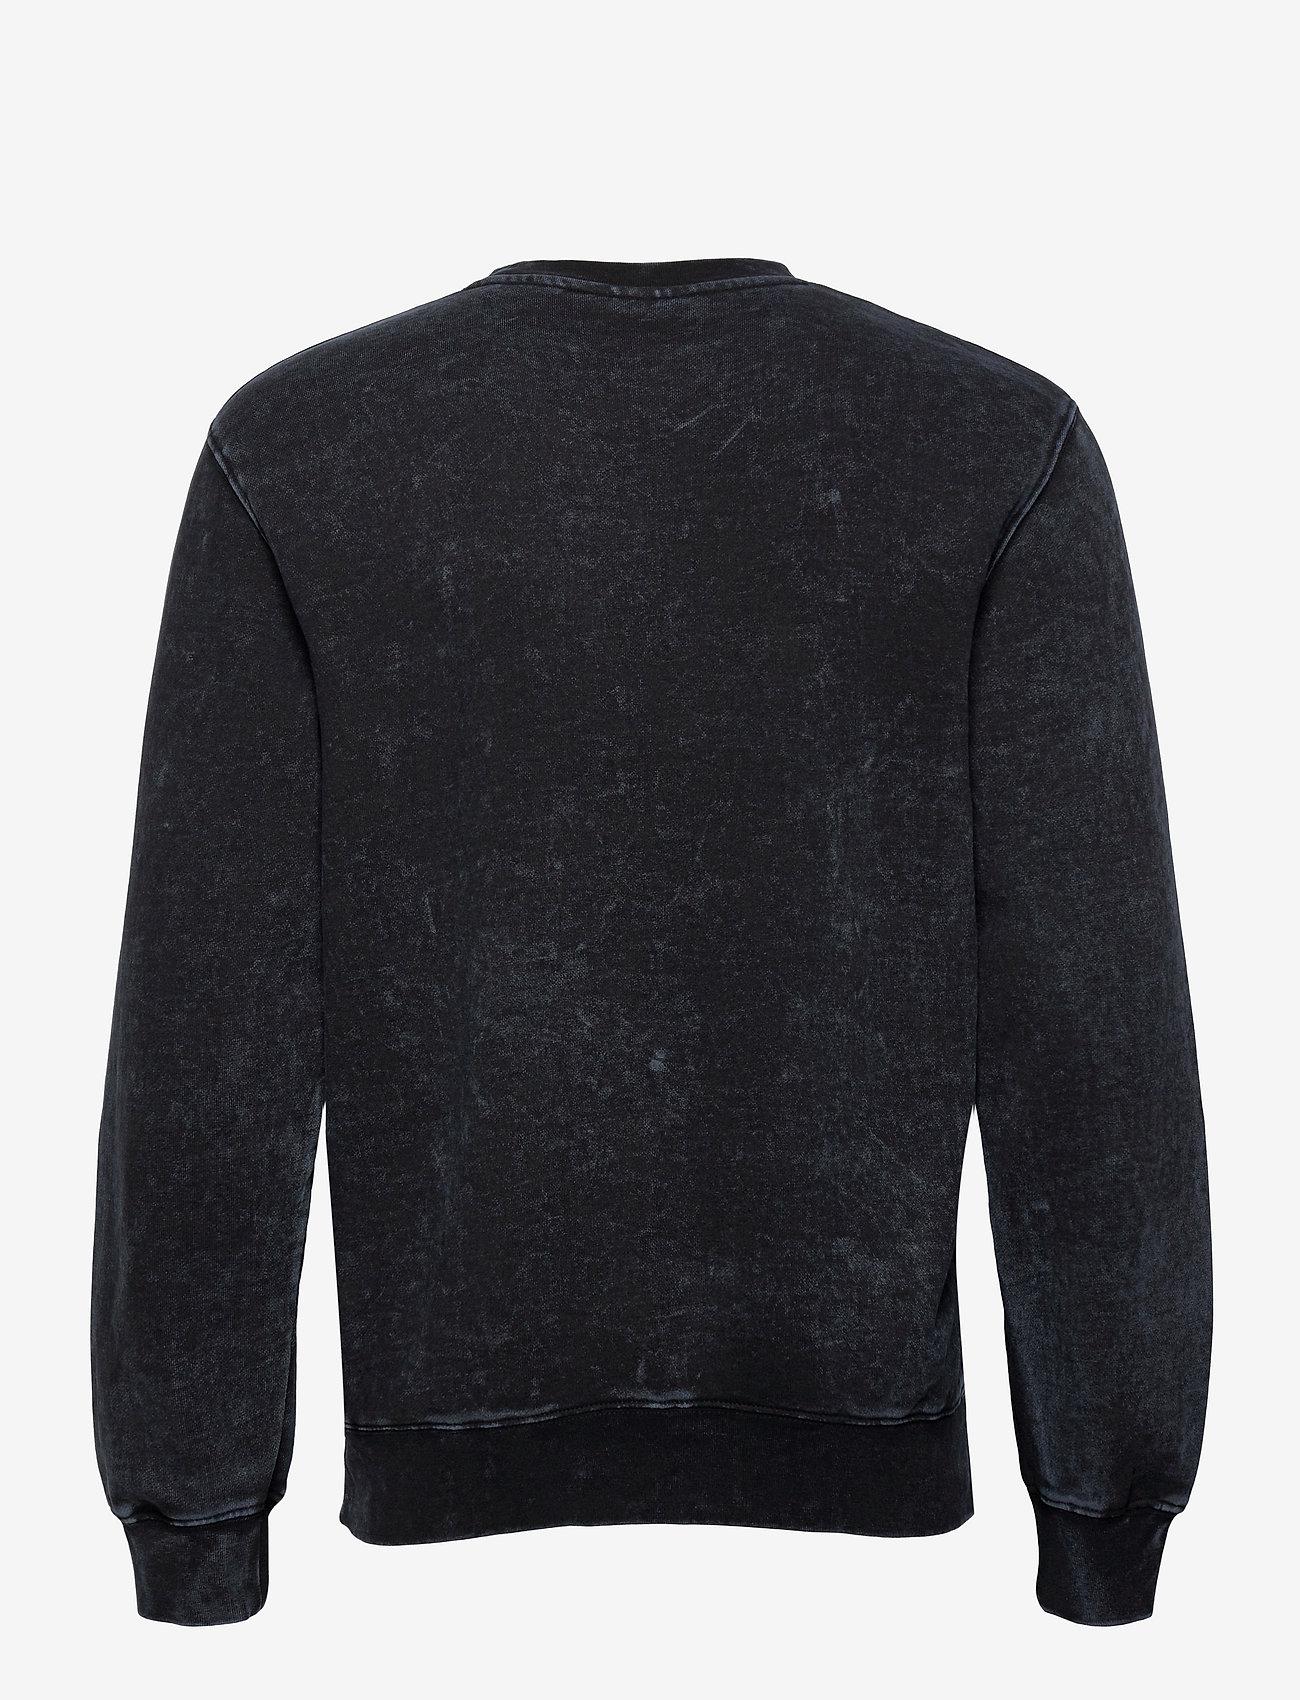 HAN Kjøbenhavn - Casual Crew - truien - denim blue acid - 1